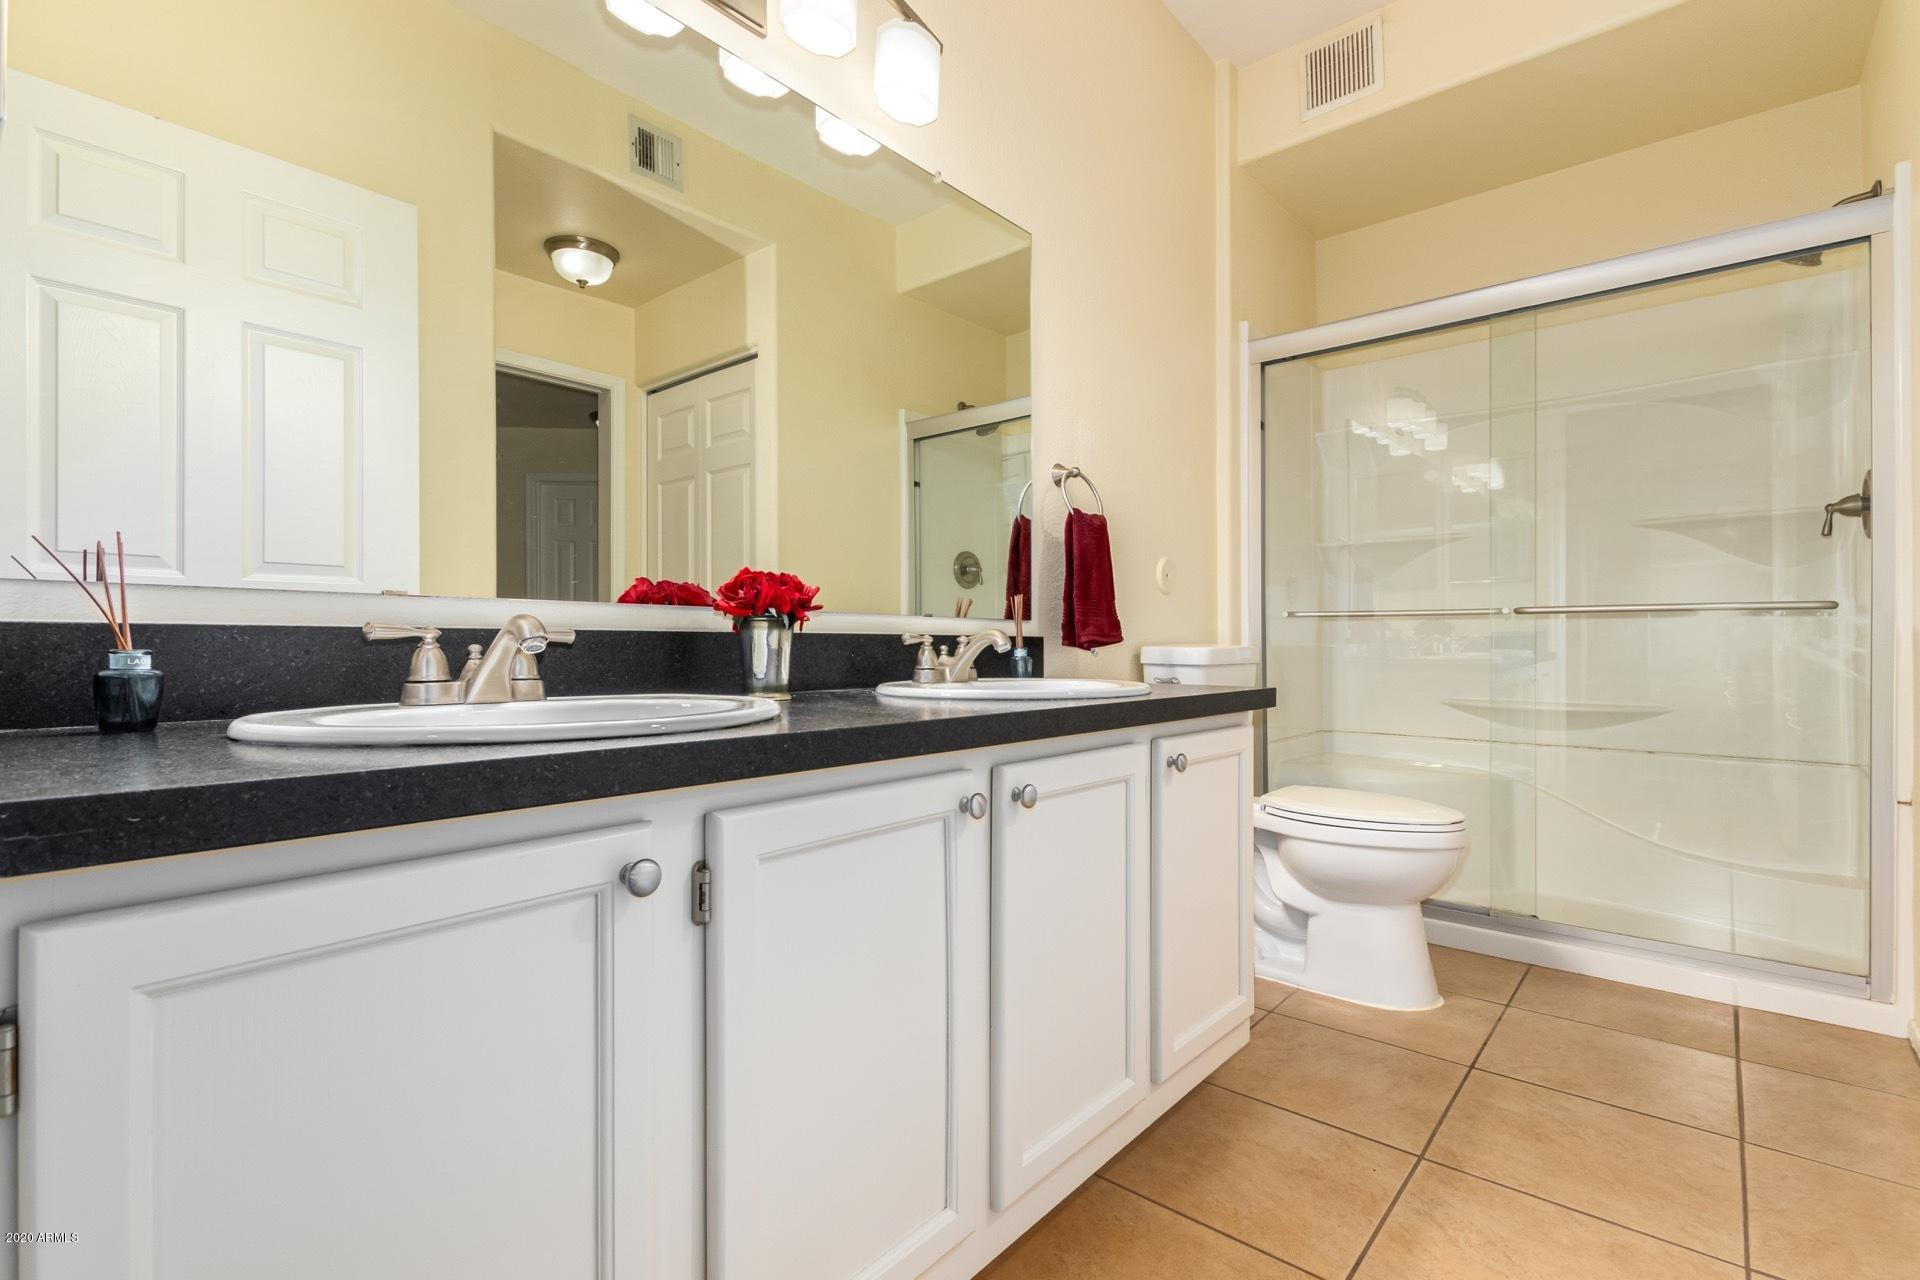 Photo #7: Double sinks